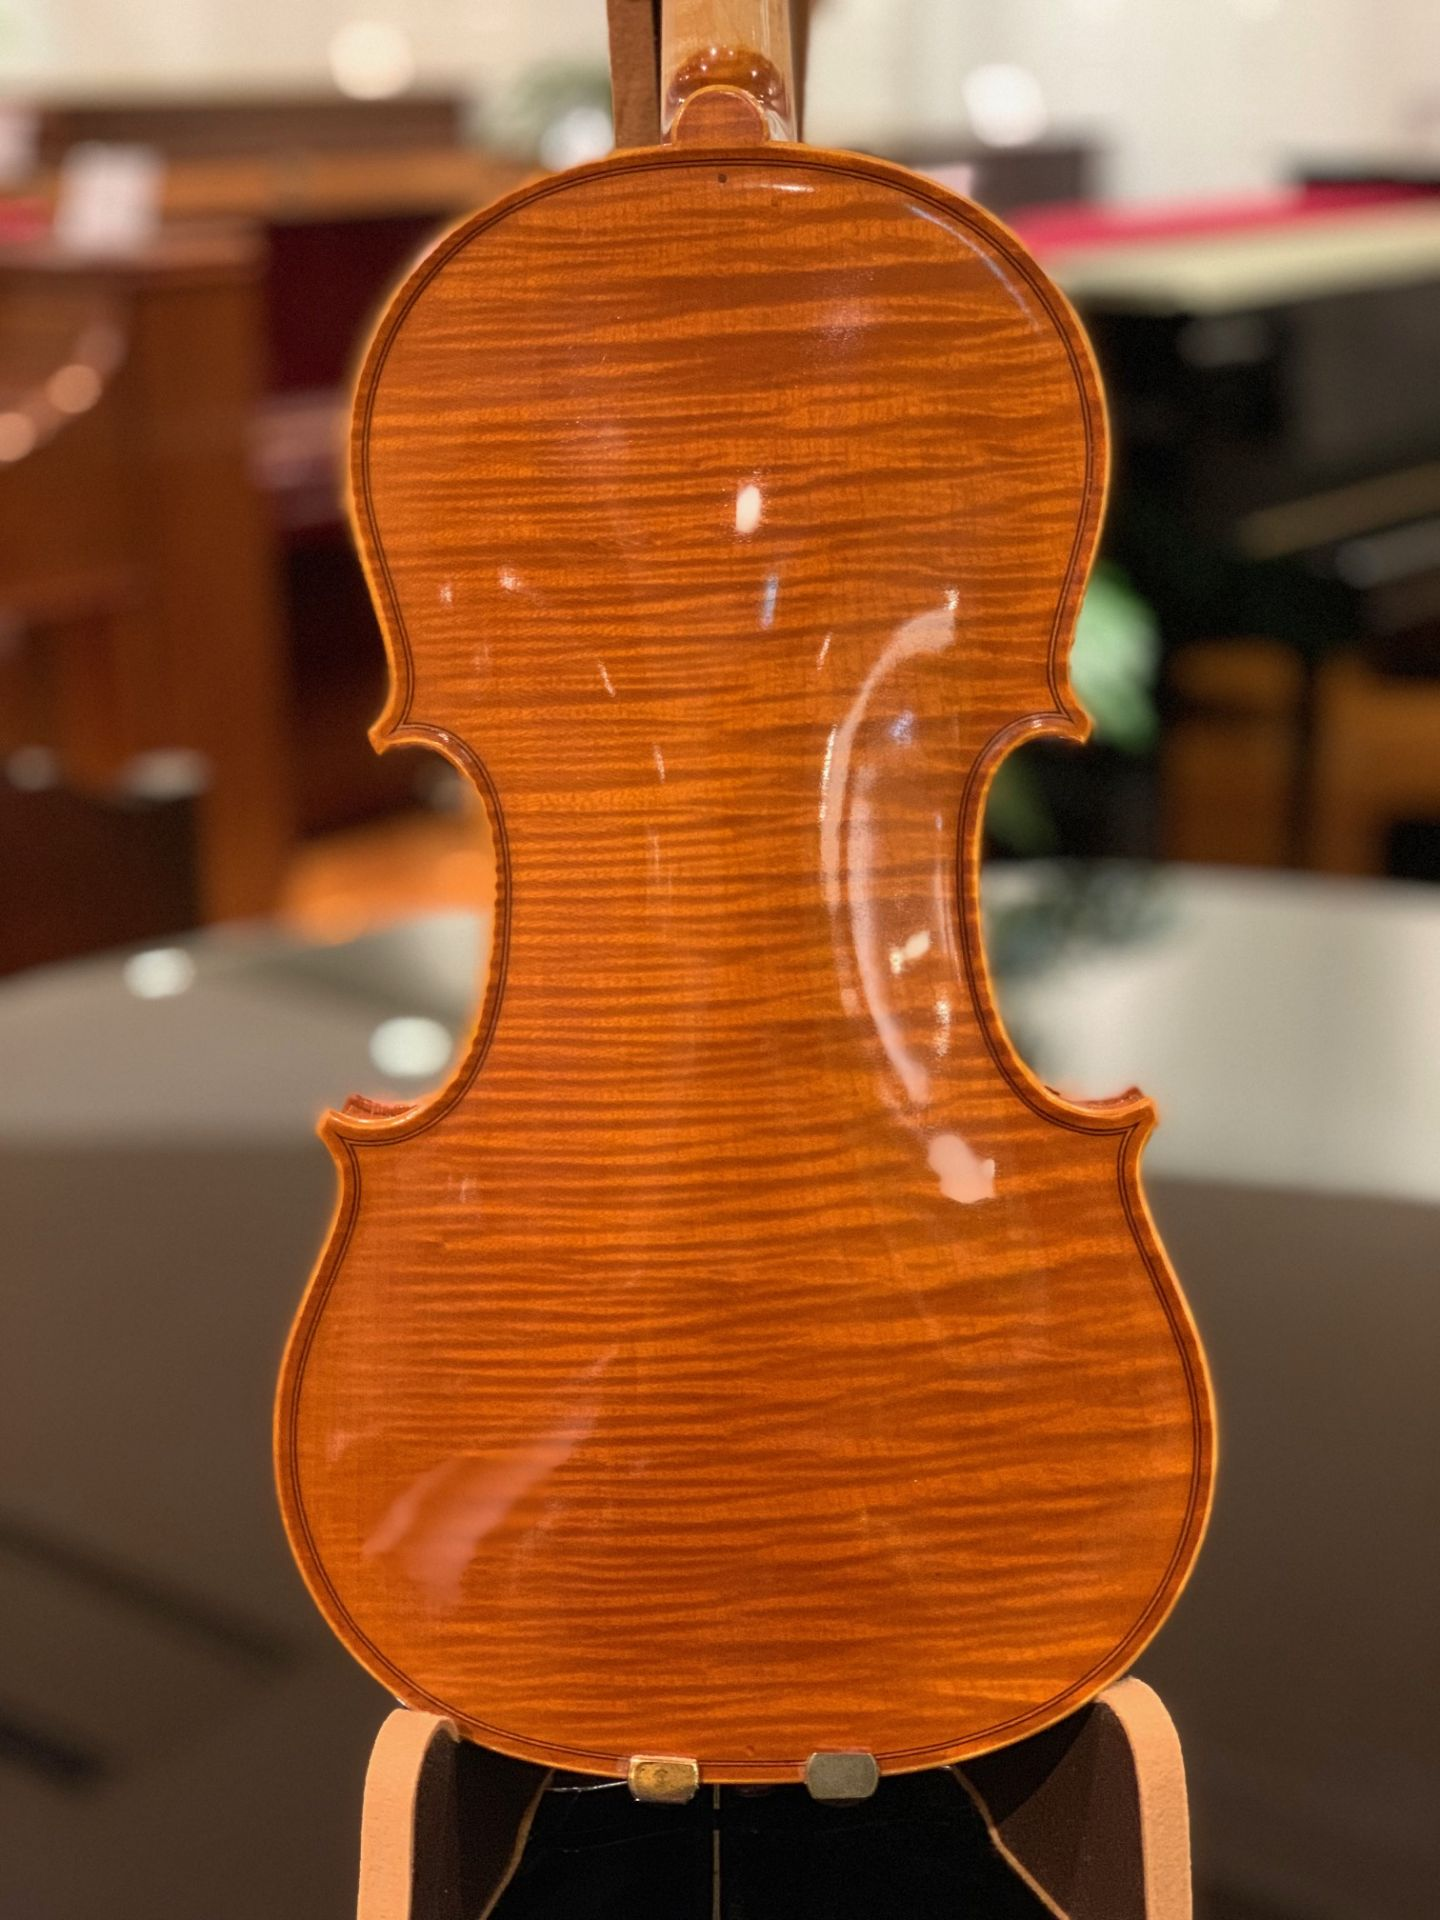 A.Commendulli/2015 O.Schaller/1892 バイオリン入荷しました 島村楽器みなとみらい店